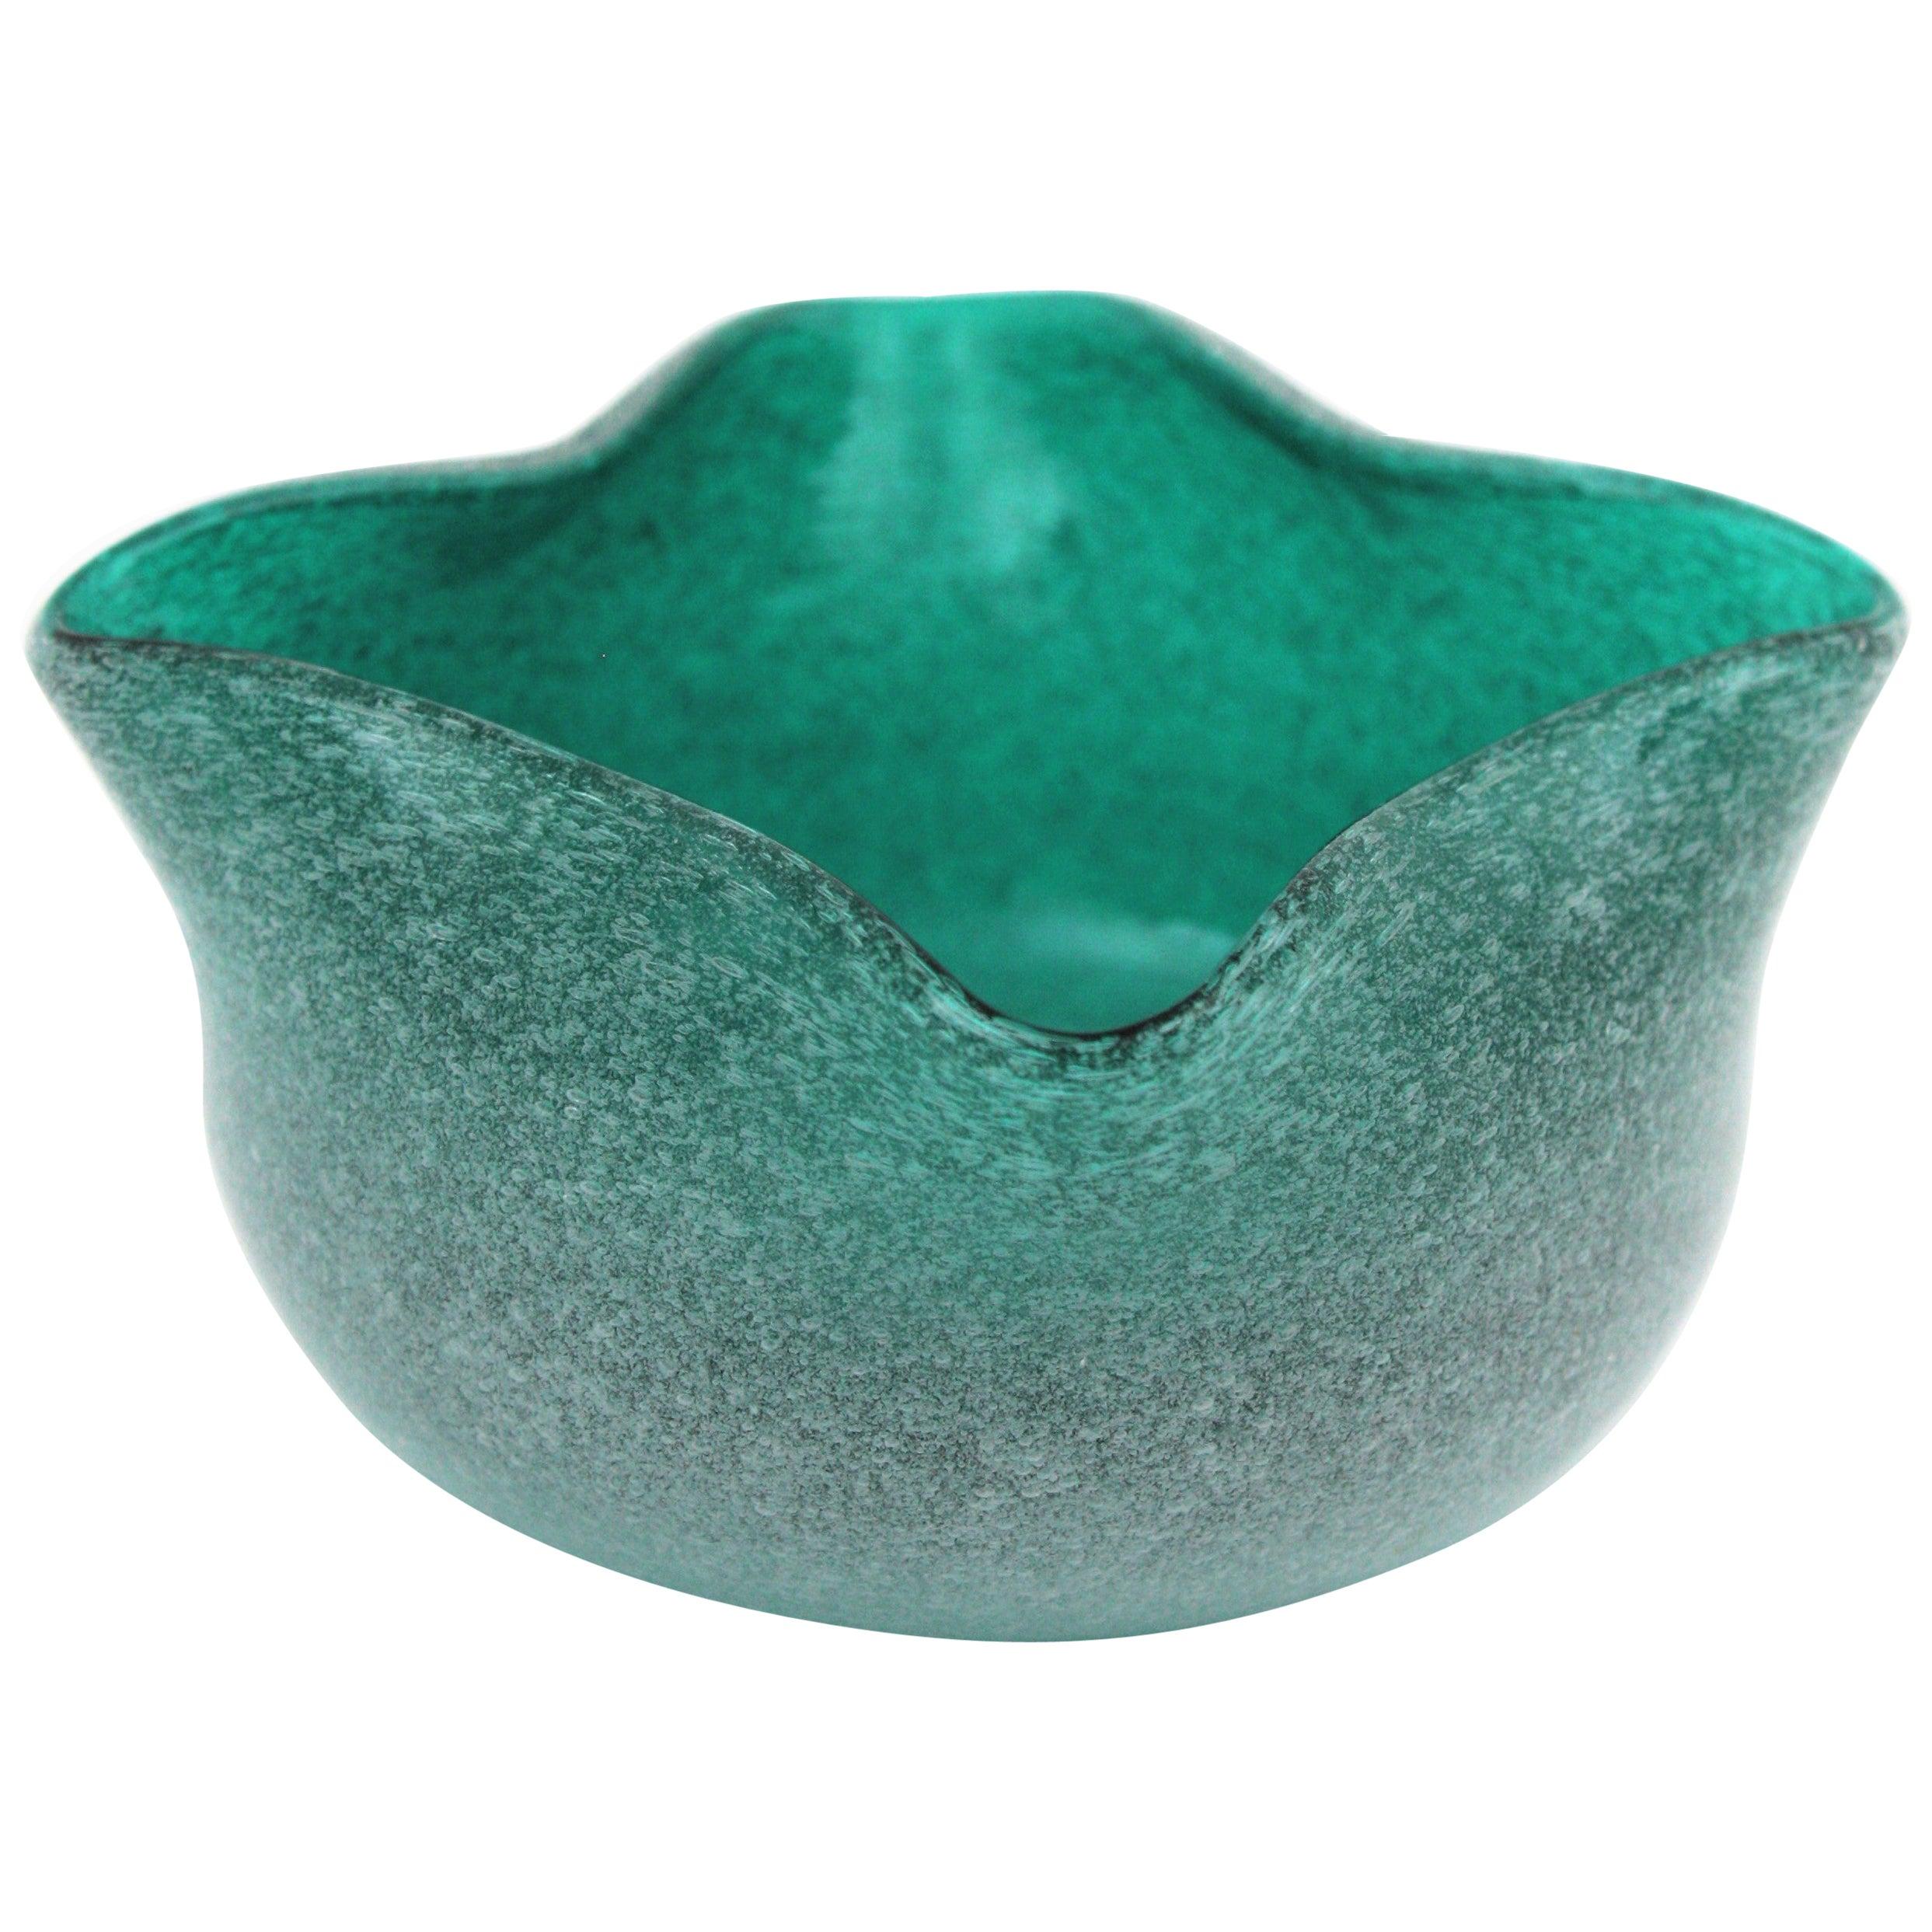 Seguso Vetri D'Arte Pulegoso Air Bubbles Green Blue Murano Art Glass Bowl